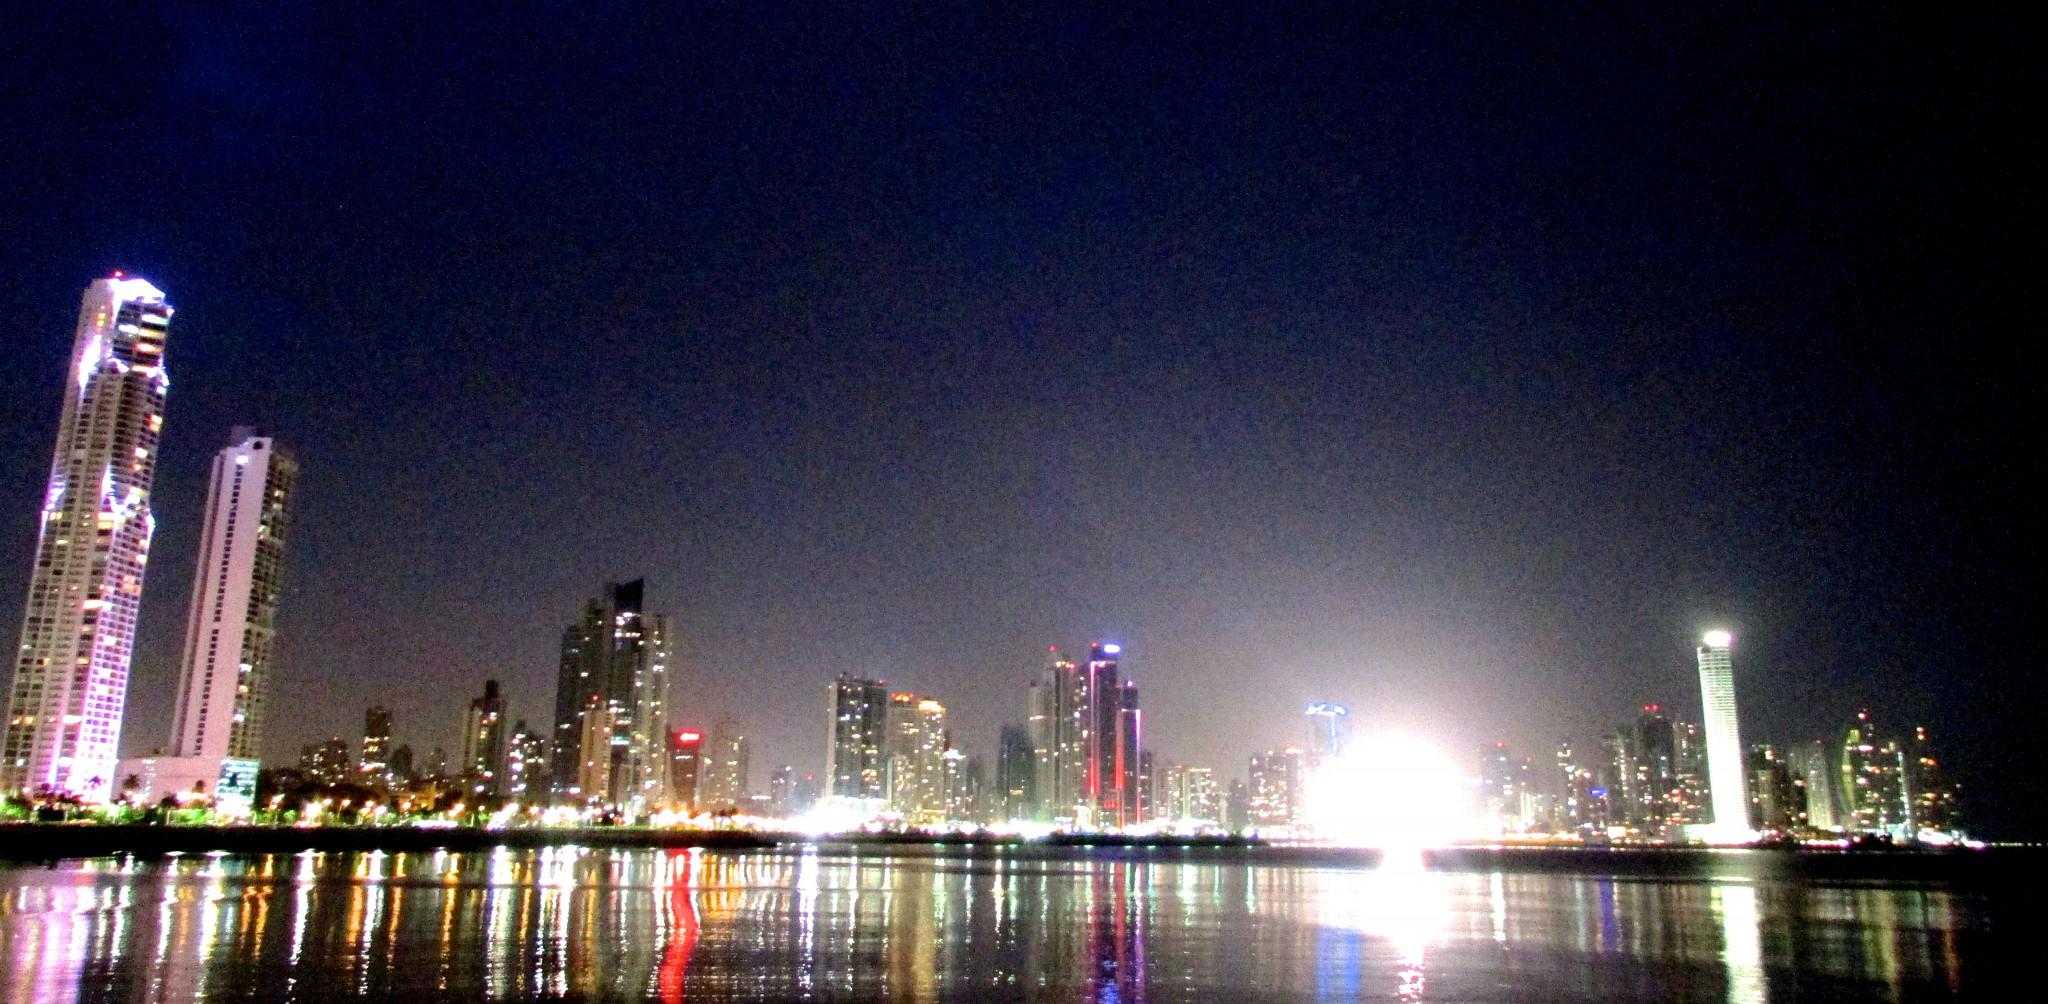 Panama City broadwalk at night